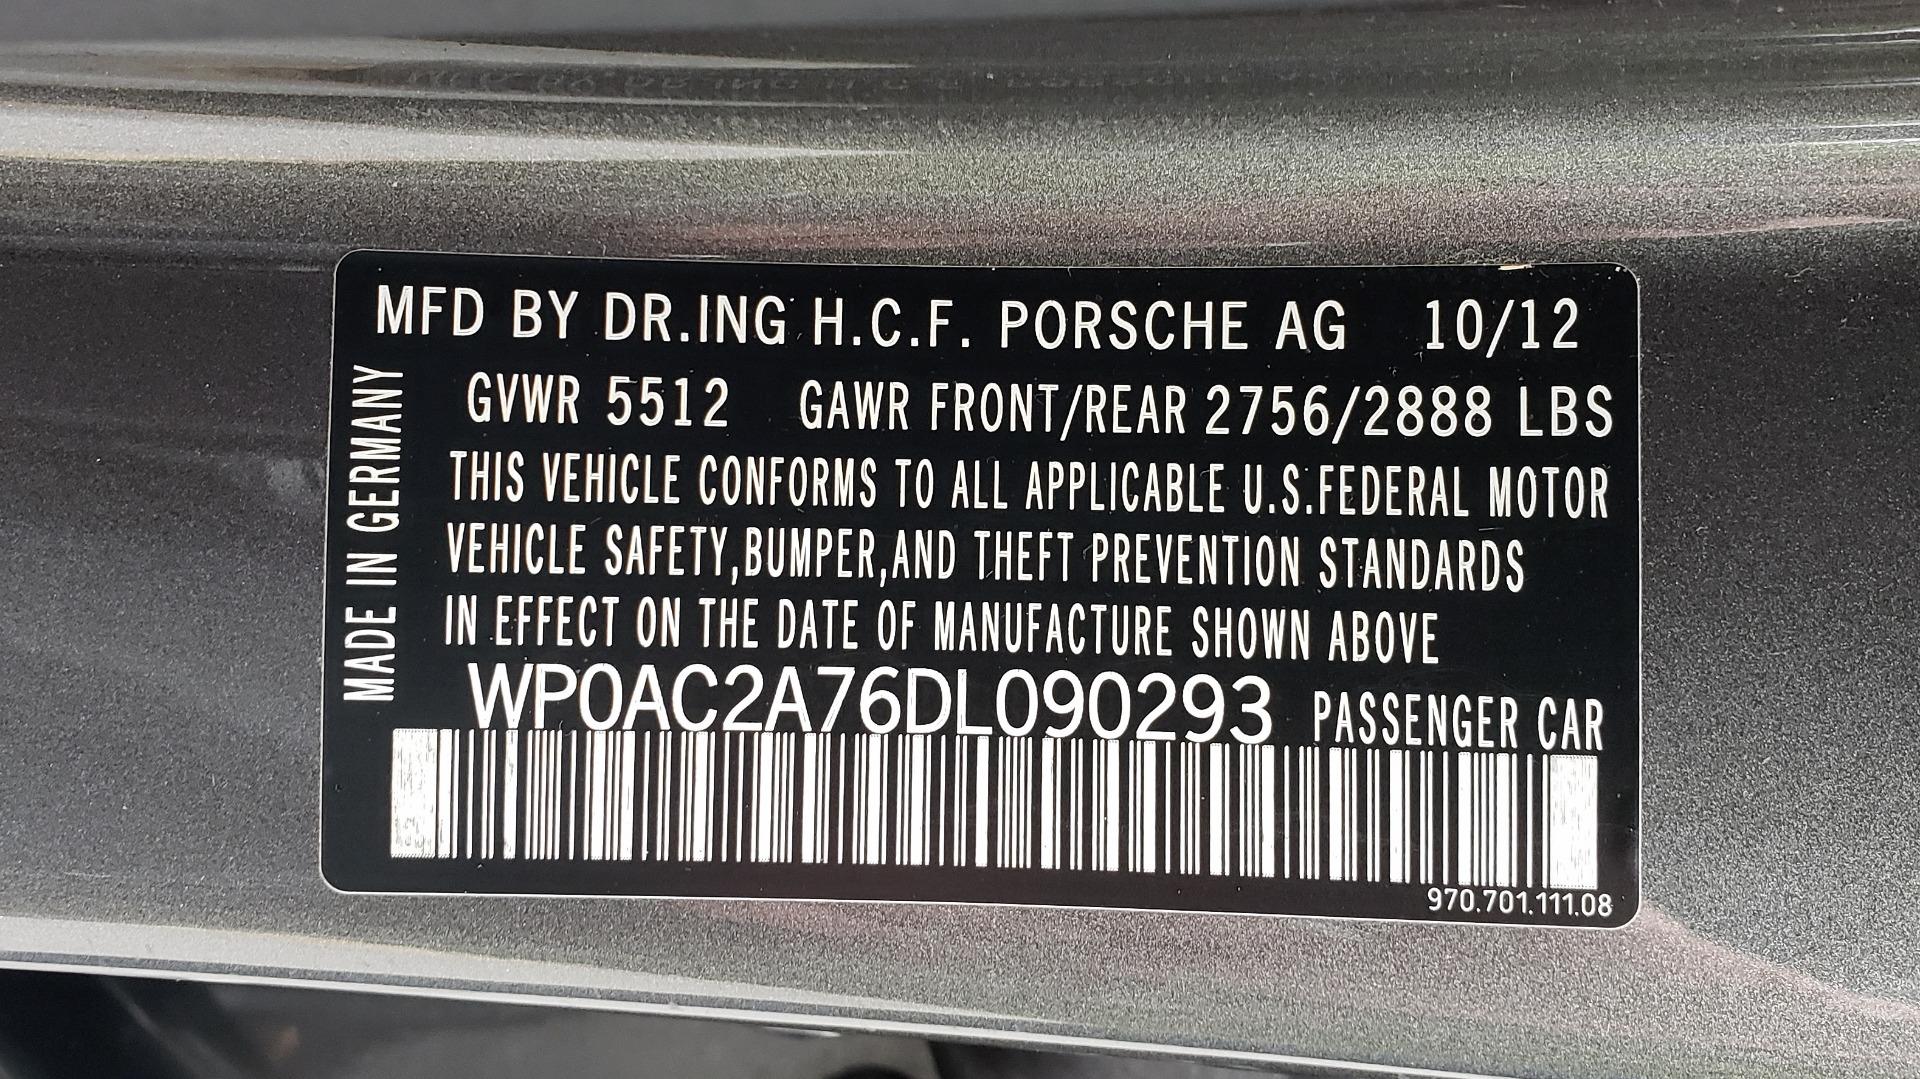 Used 2013 Porsche PANAMERA TURBO 4.8L V8 / AWD / NAV / SUNROOF / LCA / PARK ASST / BURMESTER for sale $45,995 at Formula Imports in Charlotte NC 28227 98